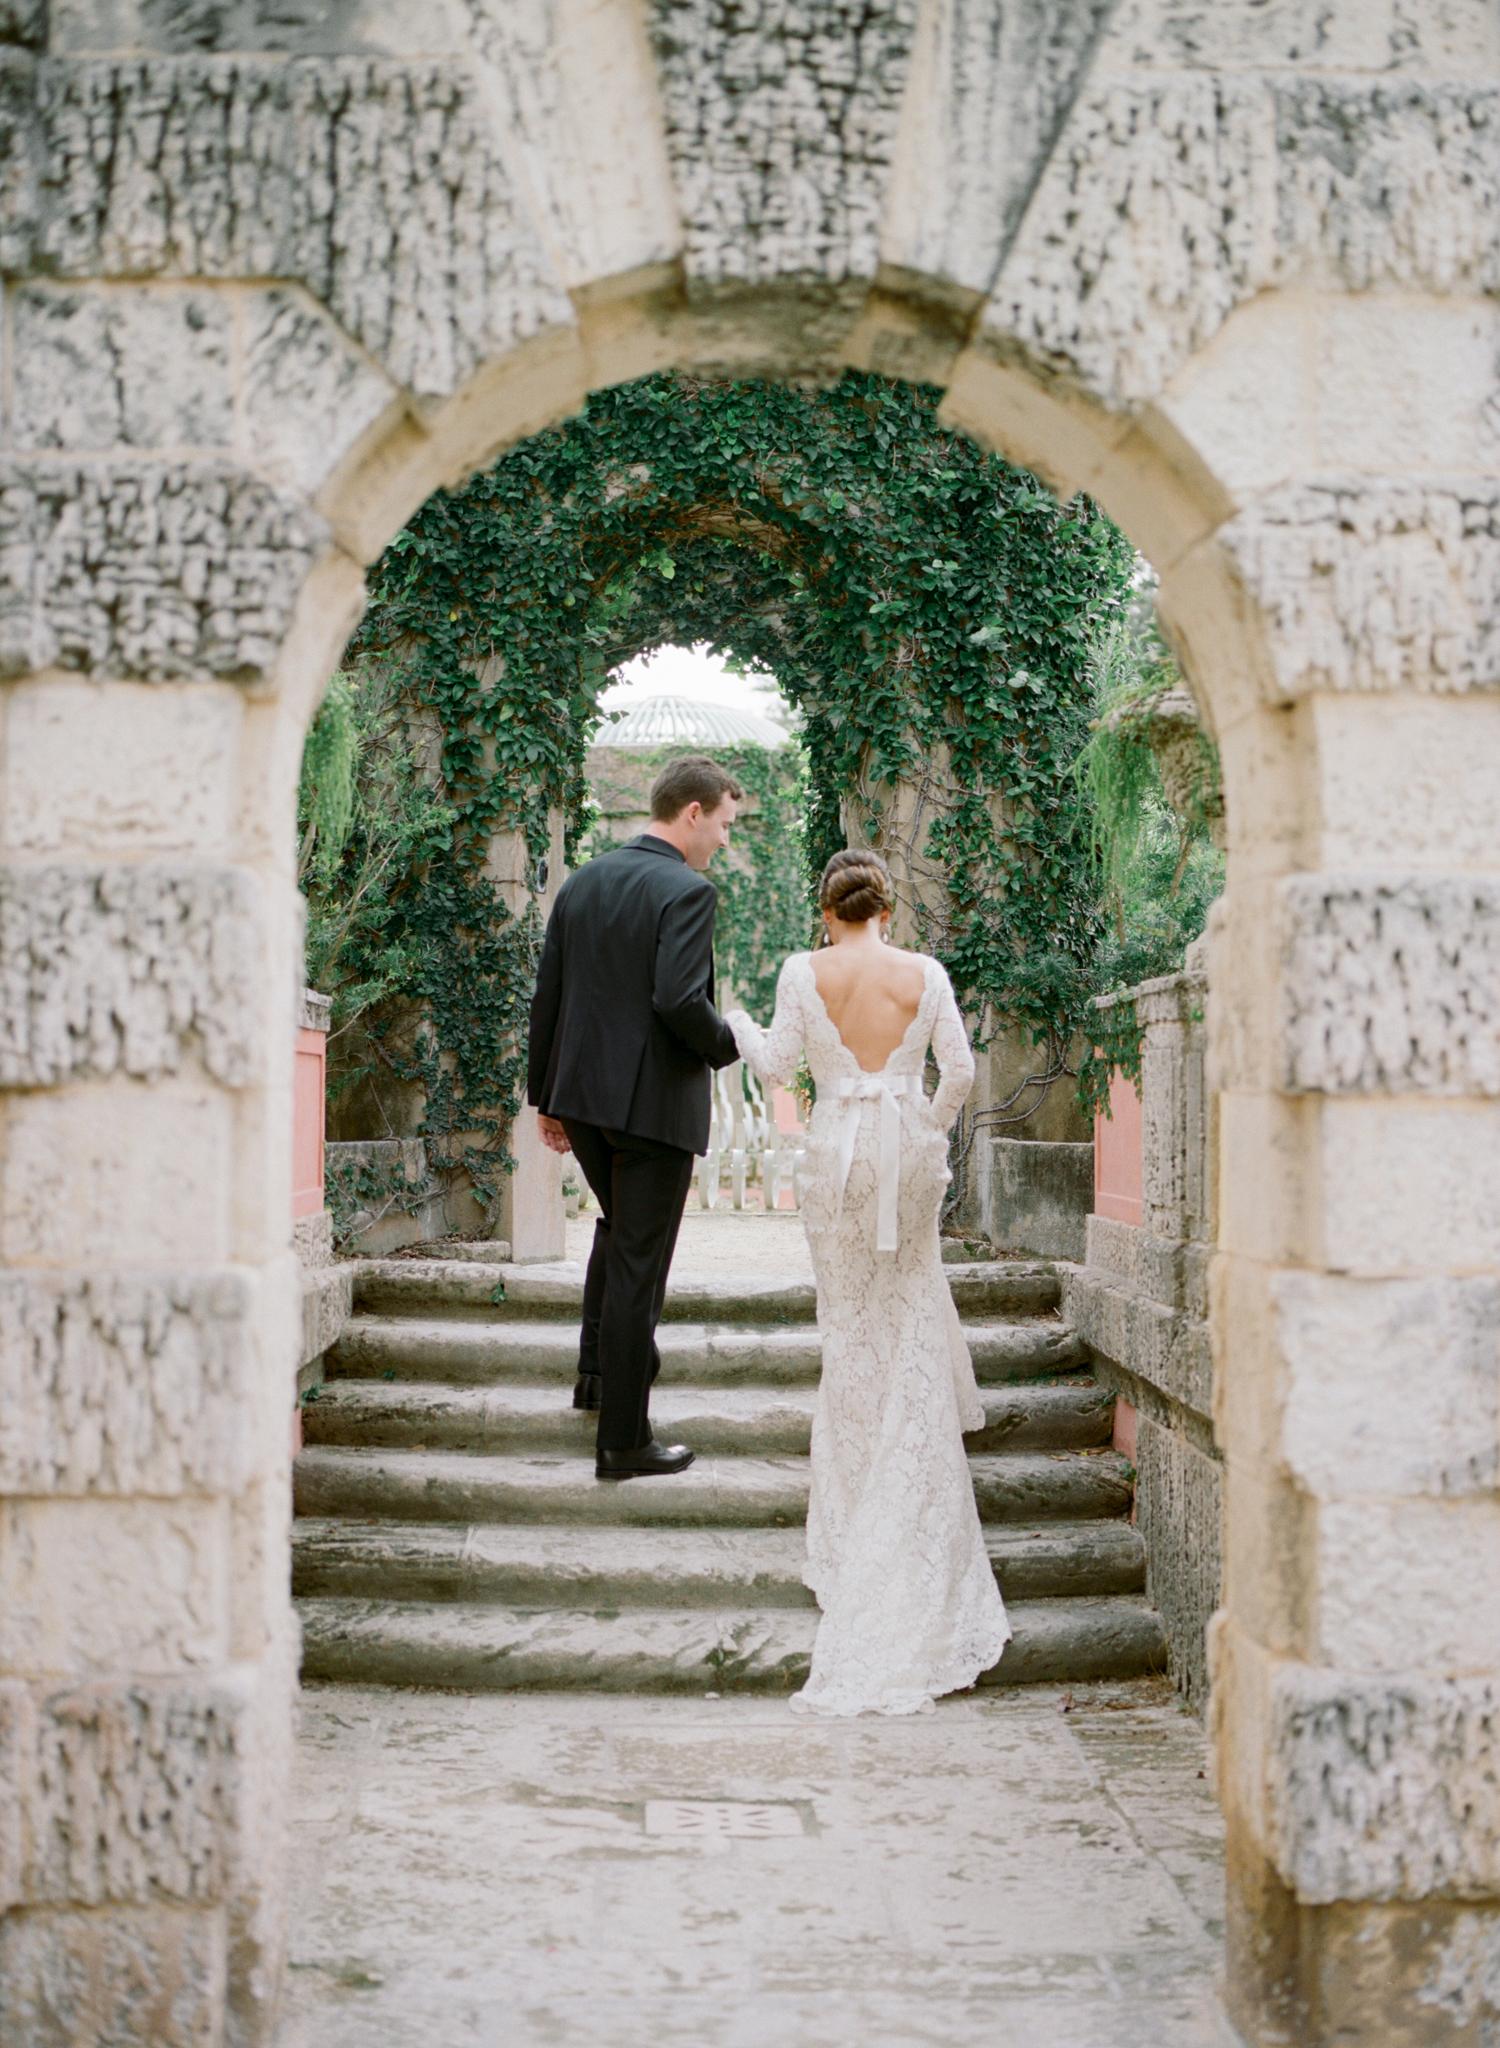 Amanda-Mike-Wedding-BrideGroom-027.jpg